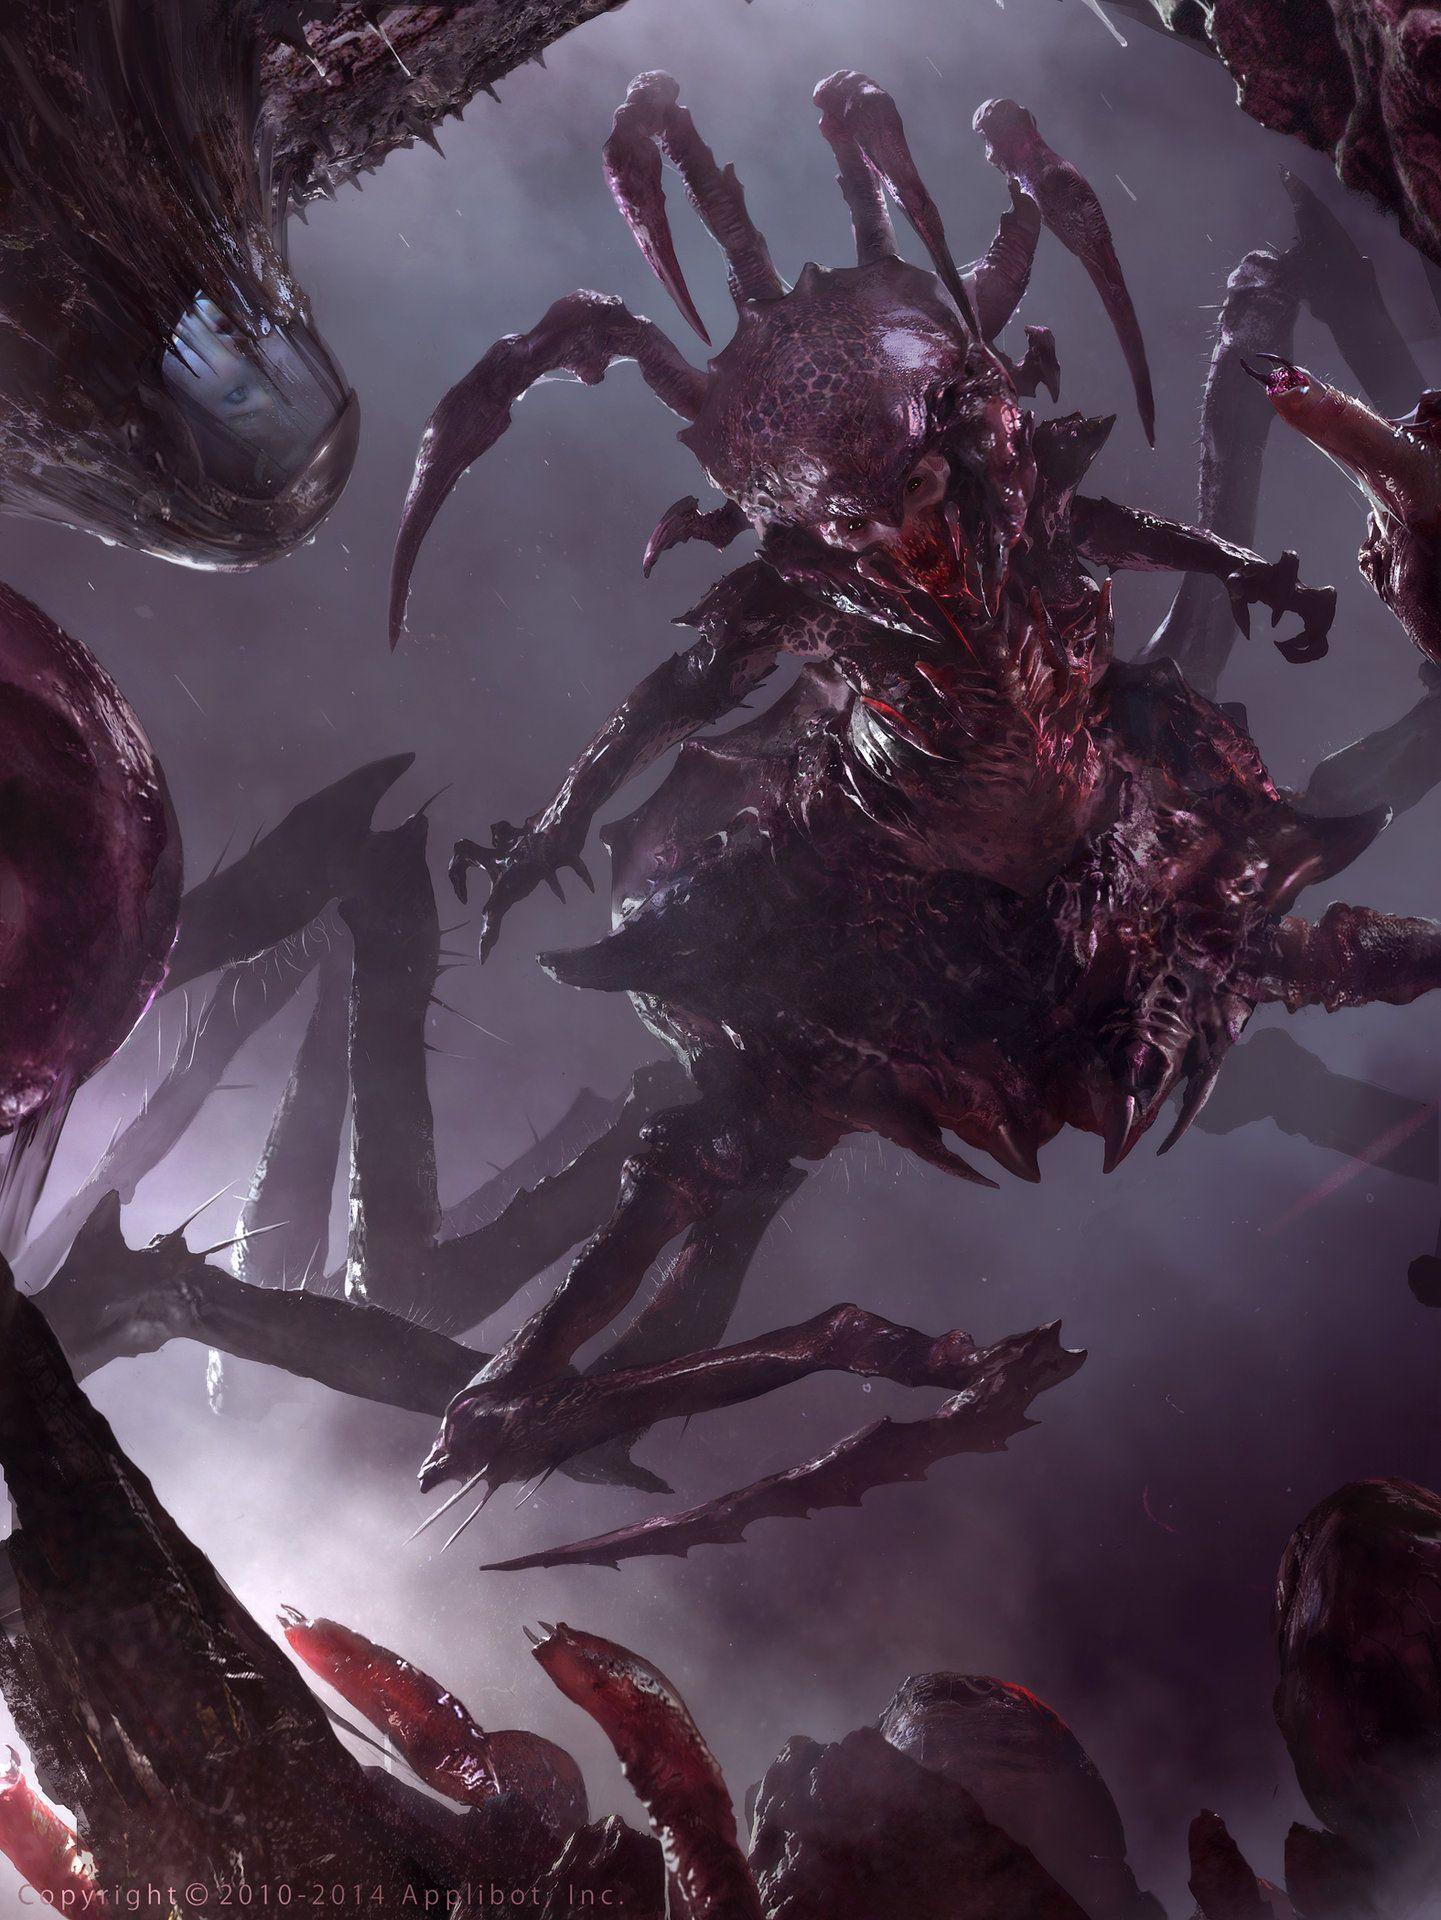 ArtStation - Demonic Queen (Advanced), Brad Rigney